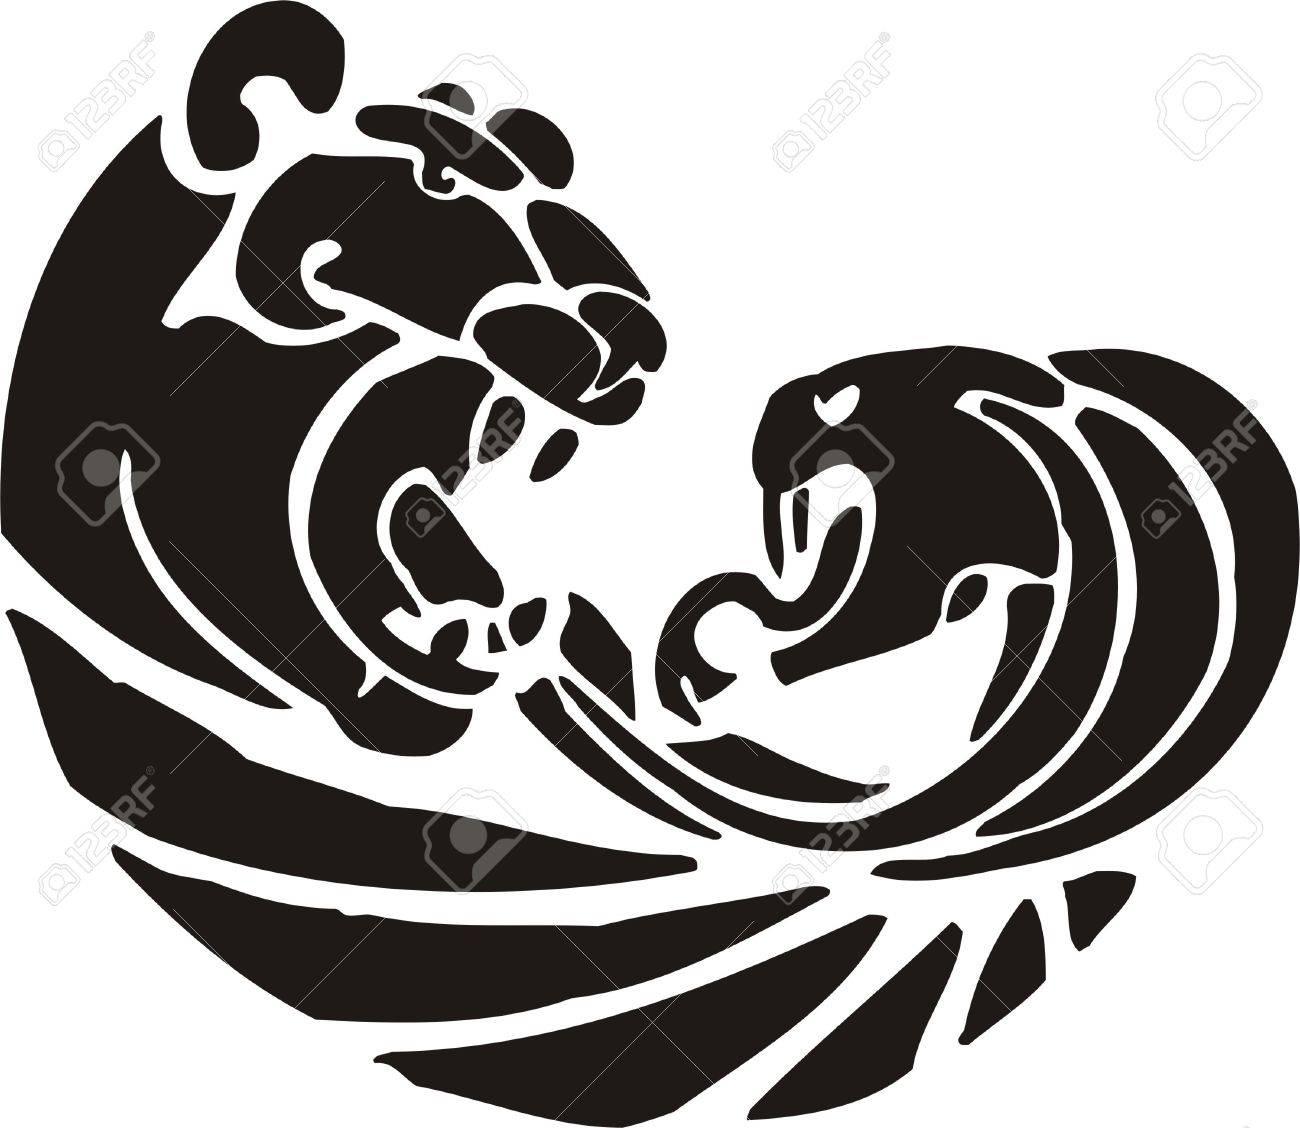 Tribal Predators.Vector illustration ready for vinyl cutting. Stock Vector - 8759689